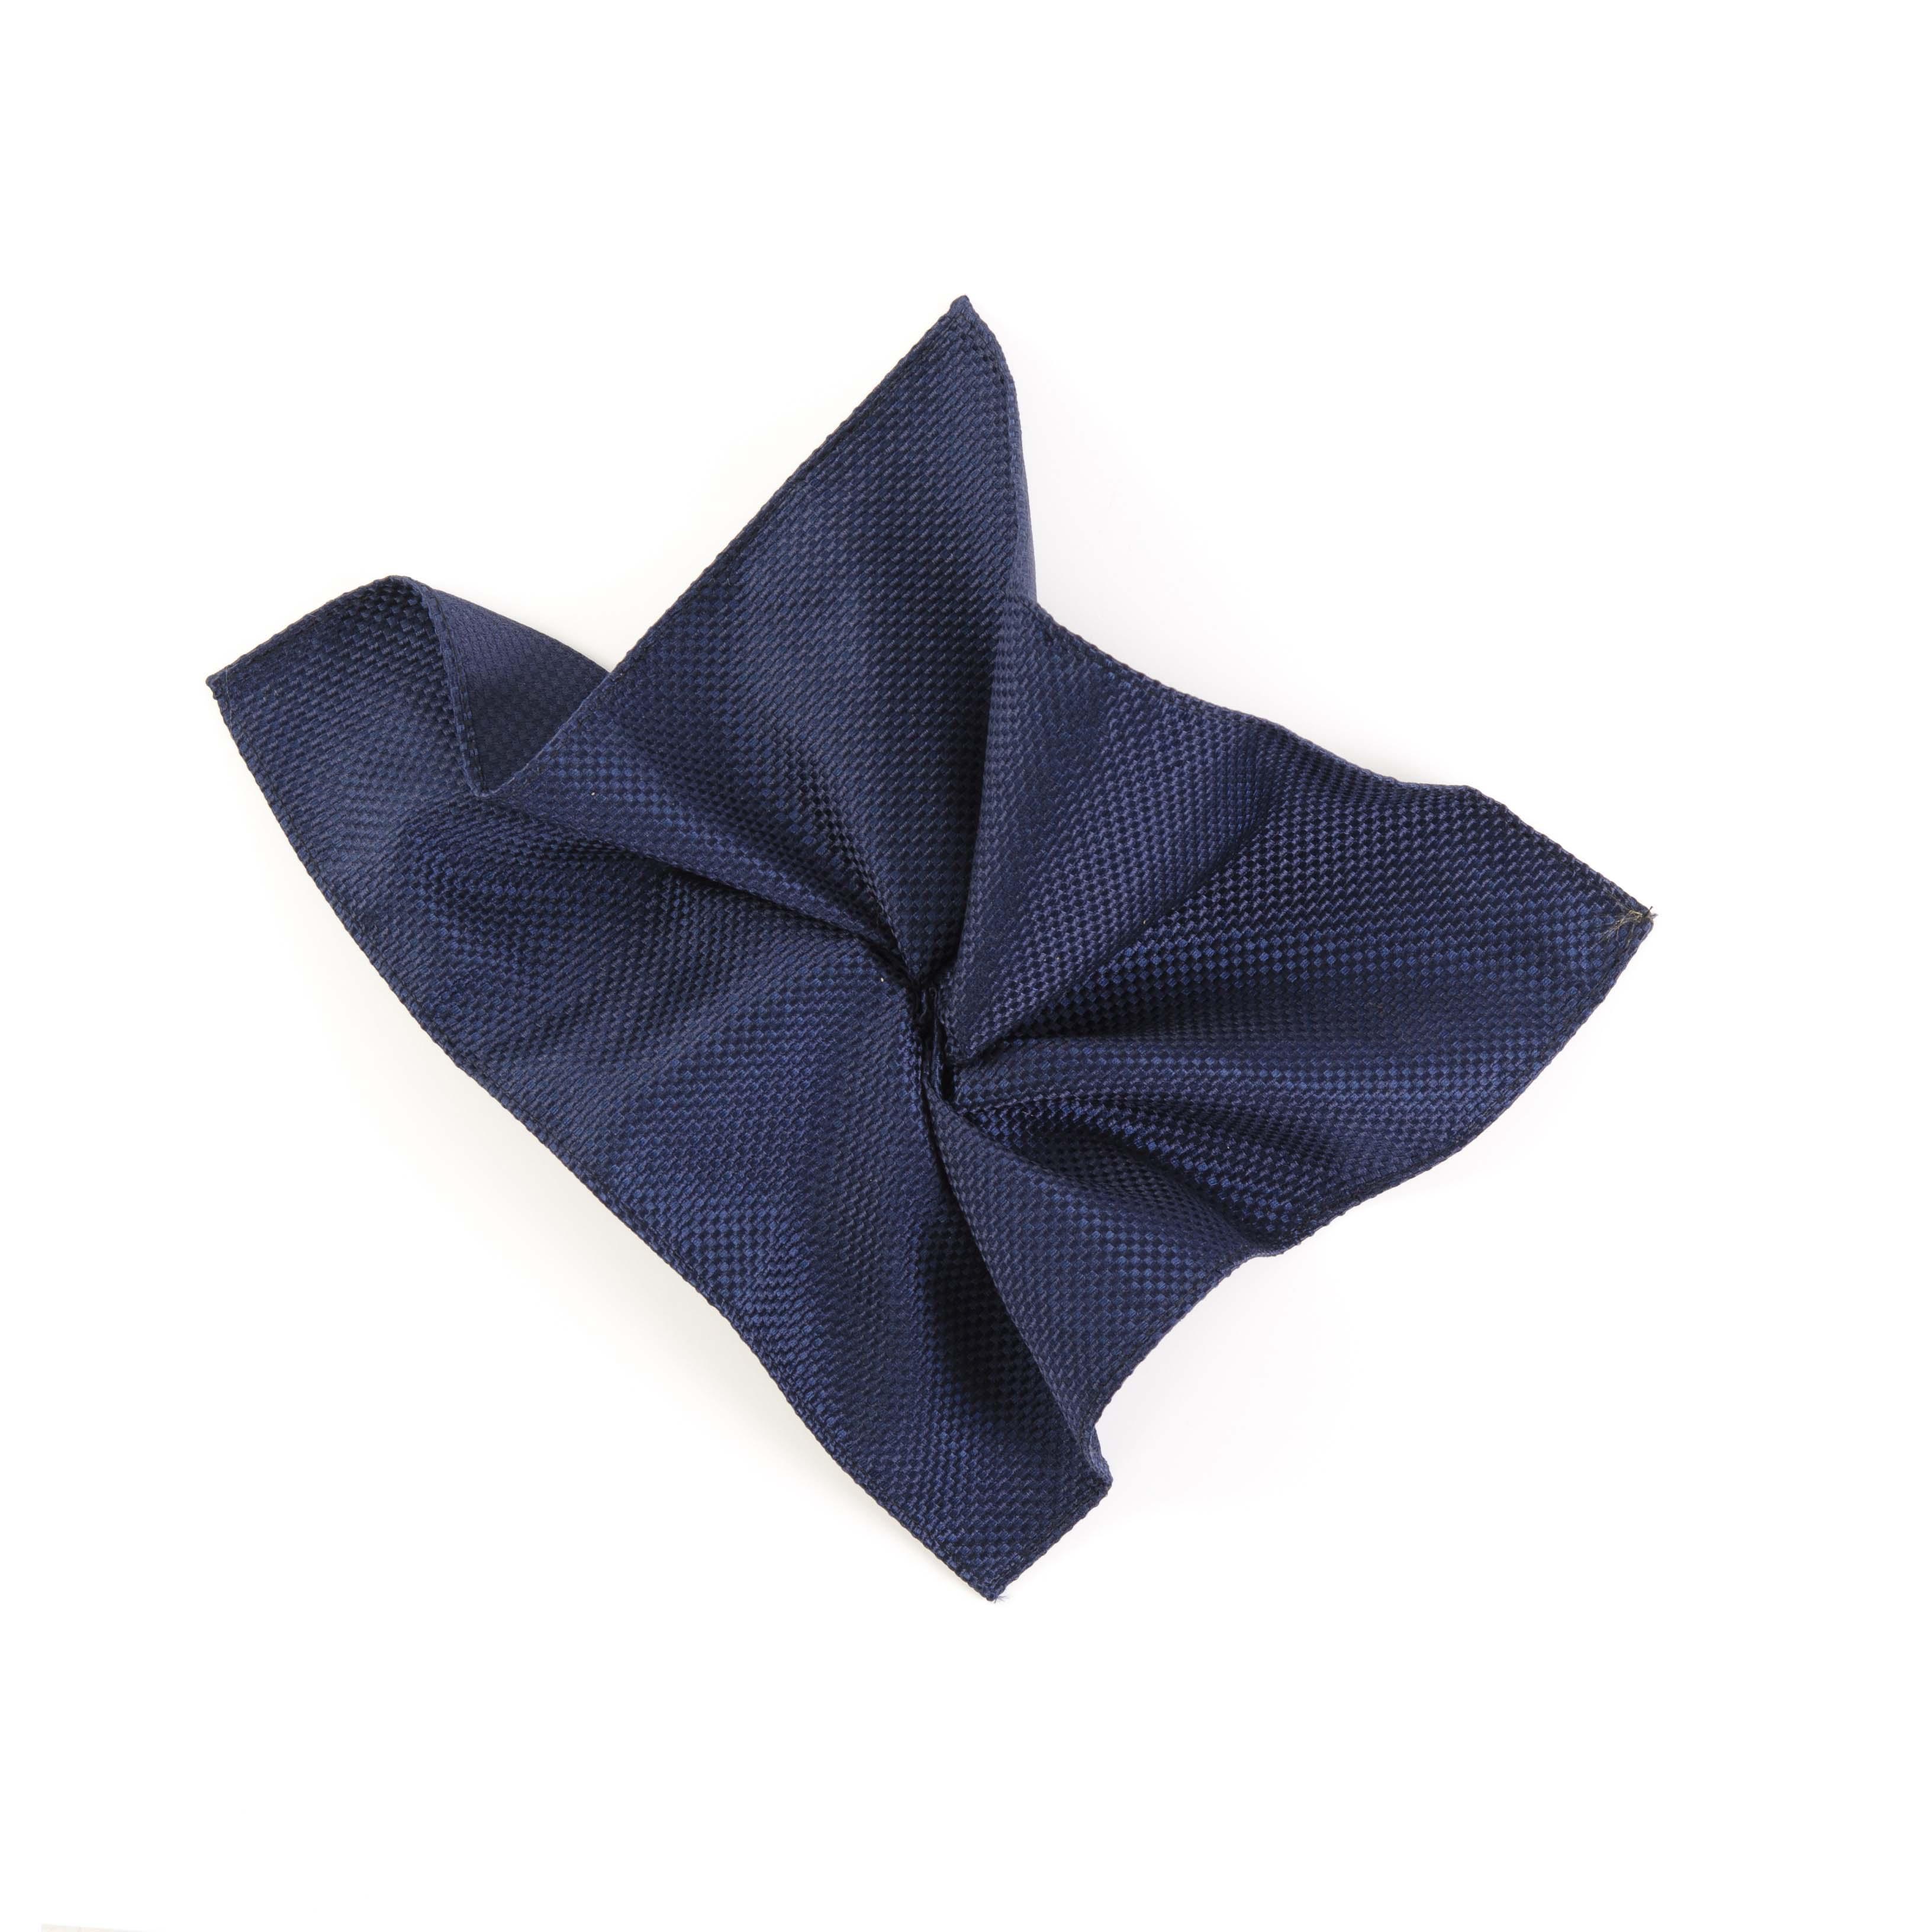 Pocket square navy panama made of silk